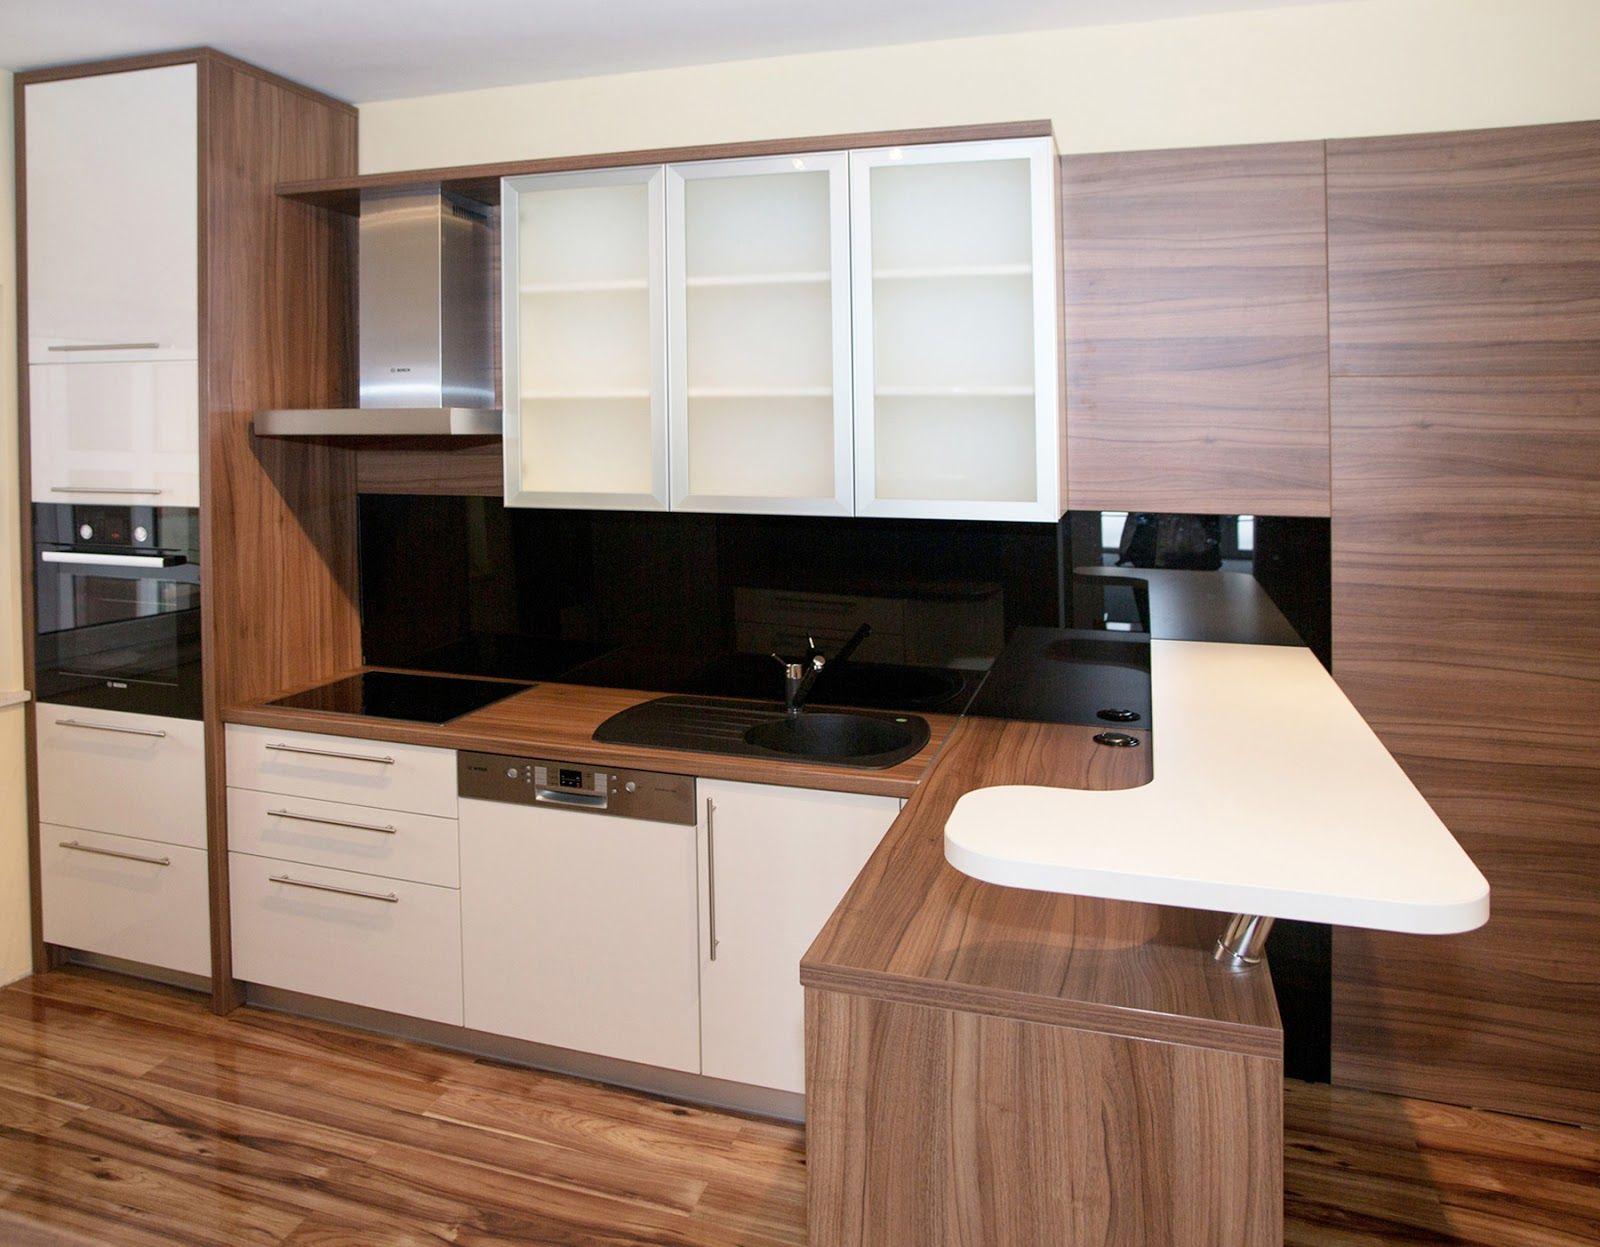 parallel kitchen design ideas for india - Google Search | kitchen ...